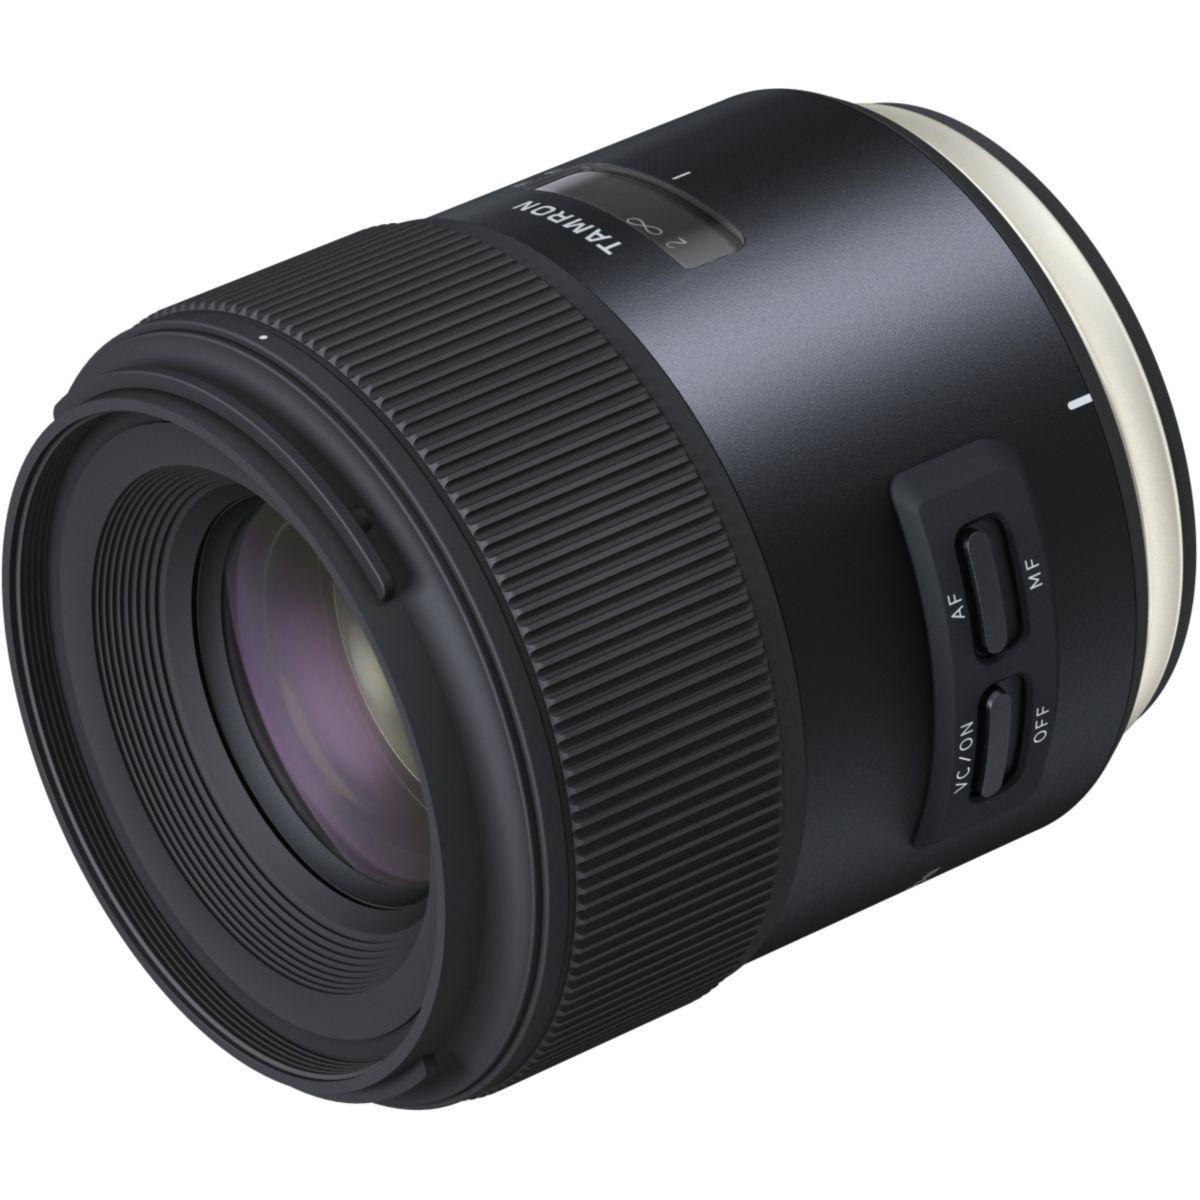 Objectif pour Reflex TAMRON SP 45mm F/1,8 Di VC USD CANON